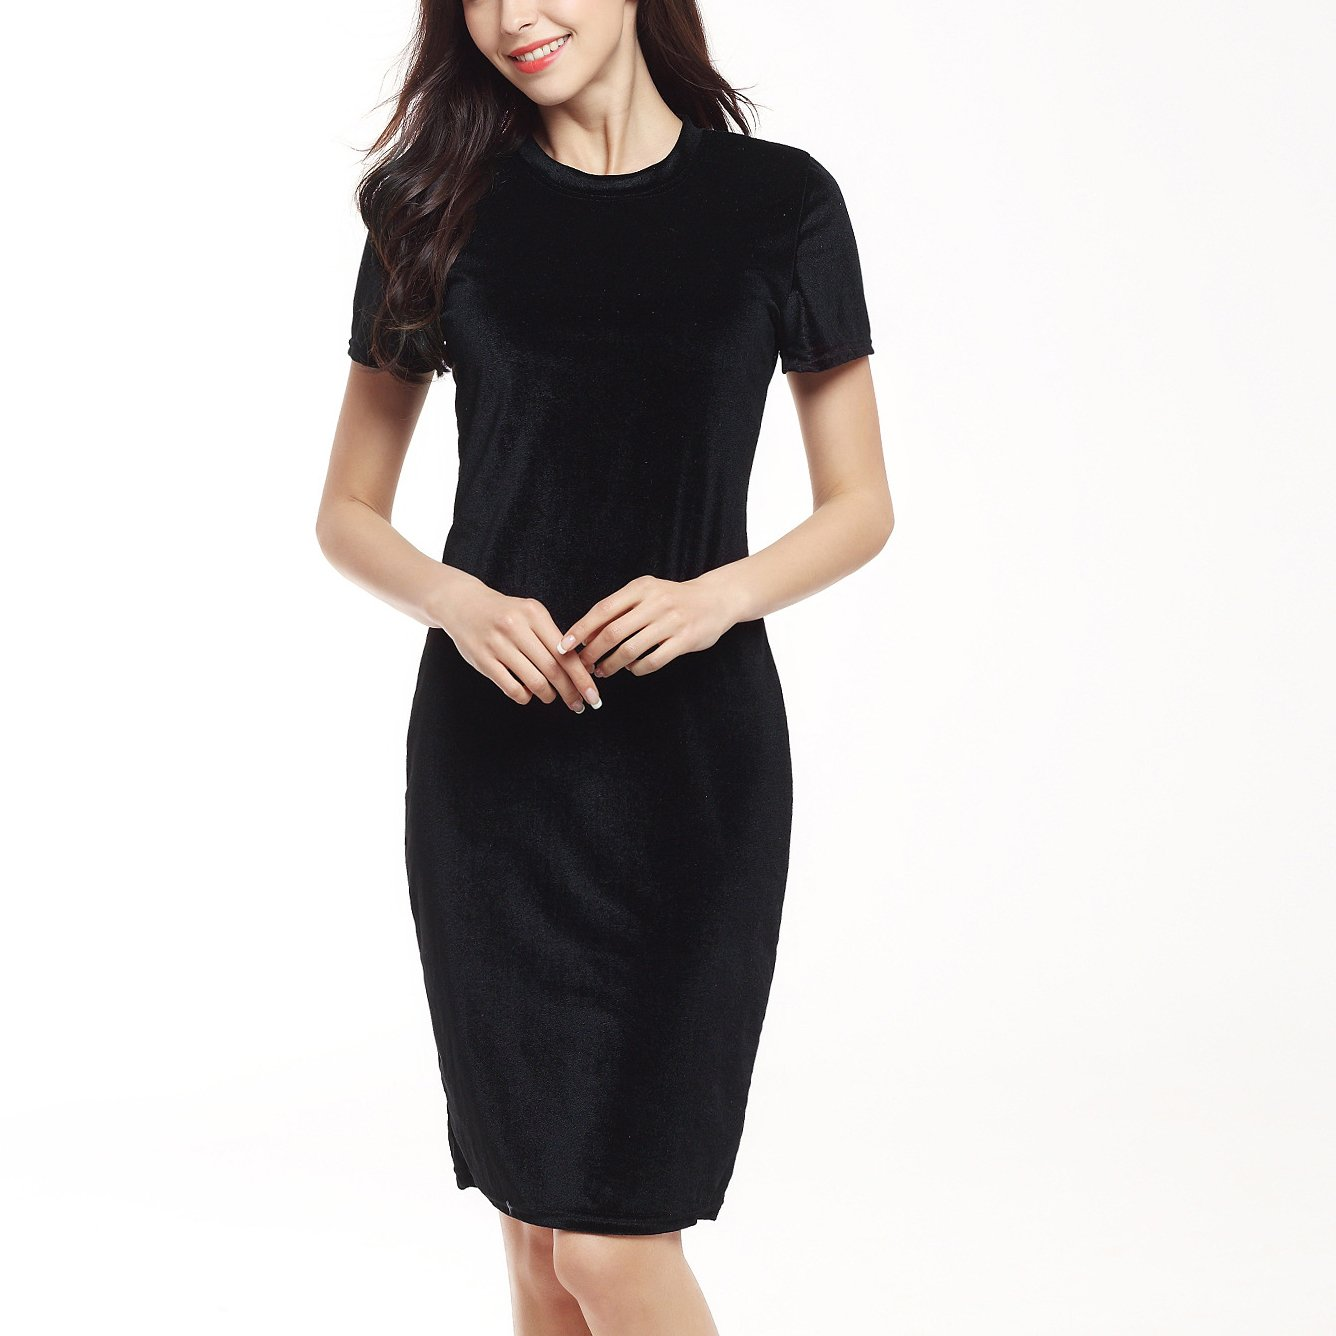 Dreamskull Summer Women Velvet Short-Sleeve Crewneck Knee Length Pencil Dress at Amazon Womens Clothing store: